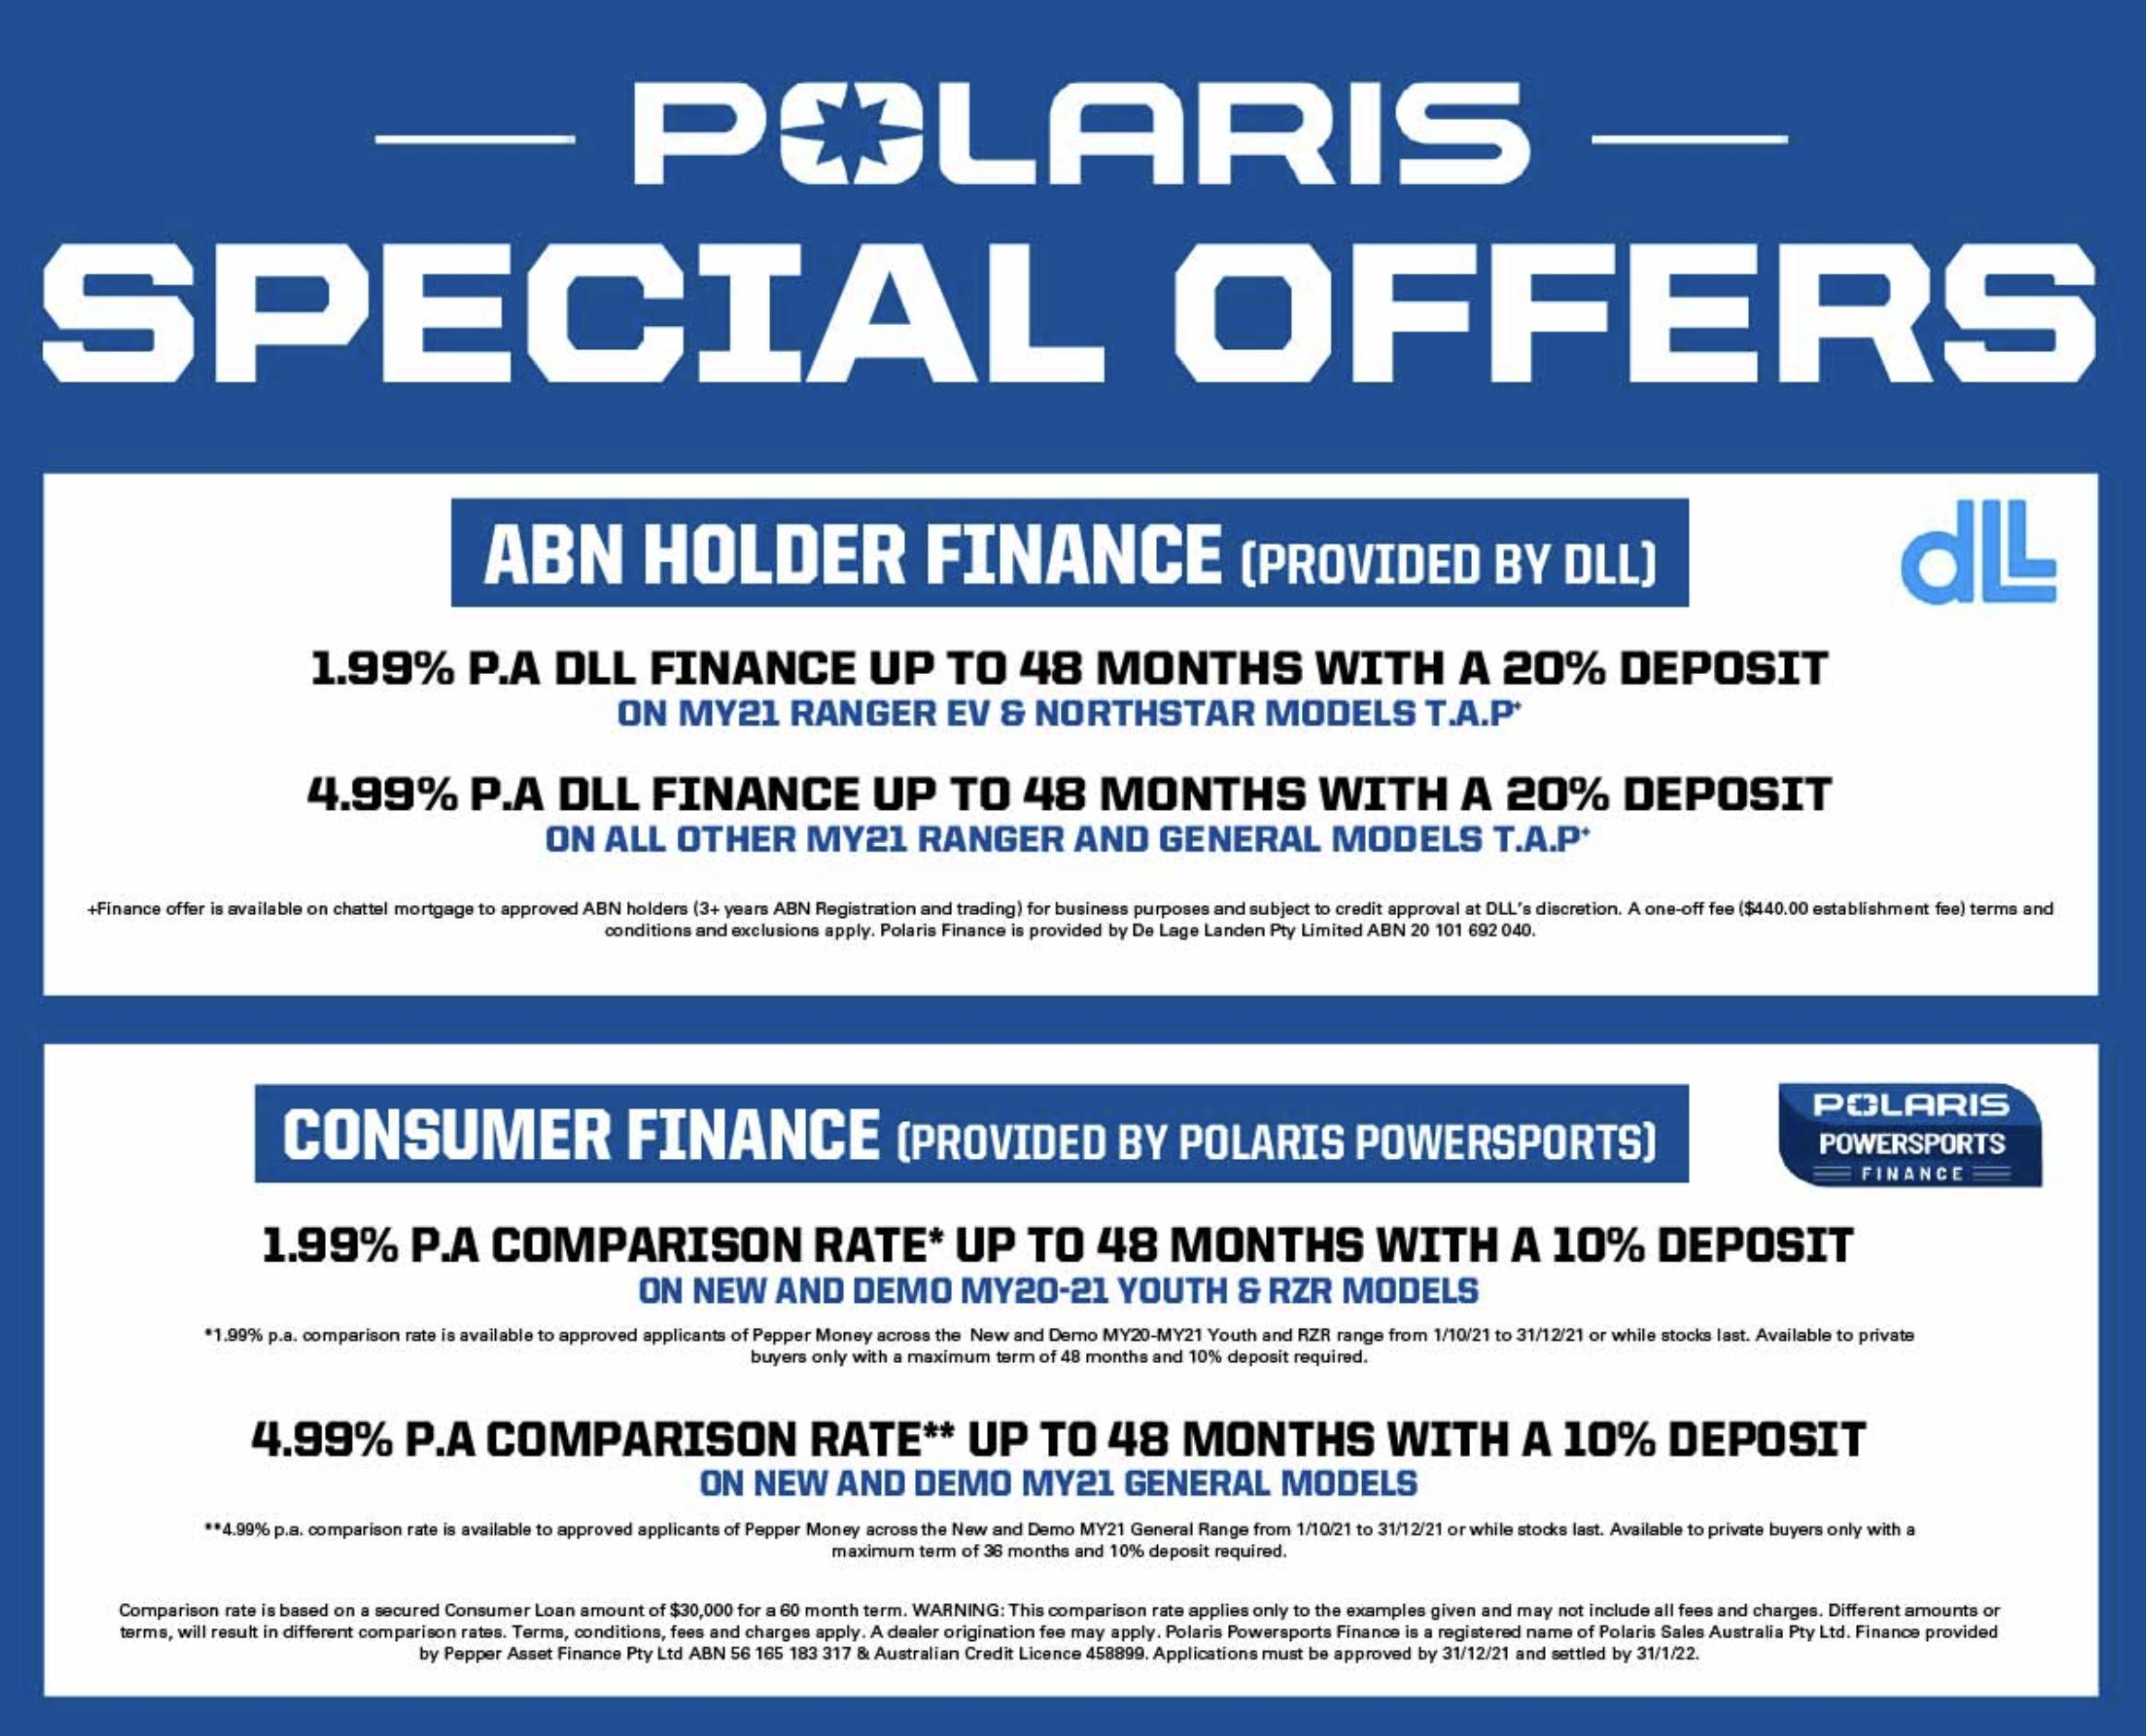 Polaris Special Offers